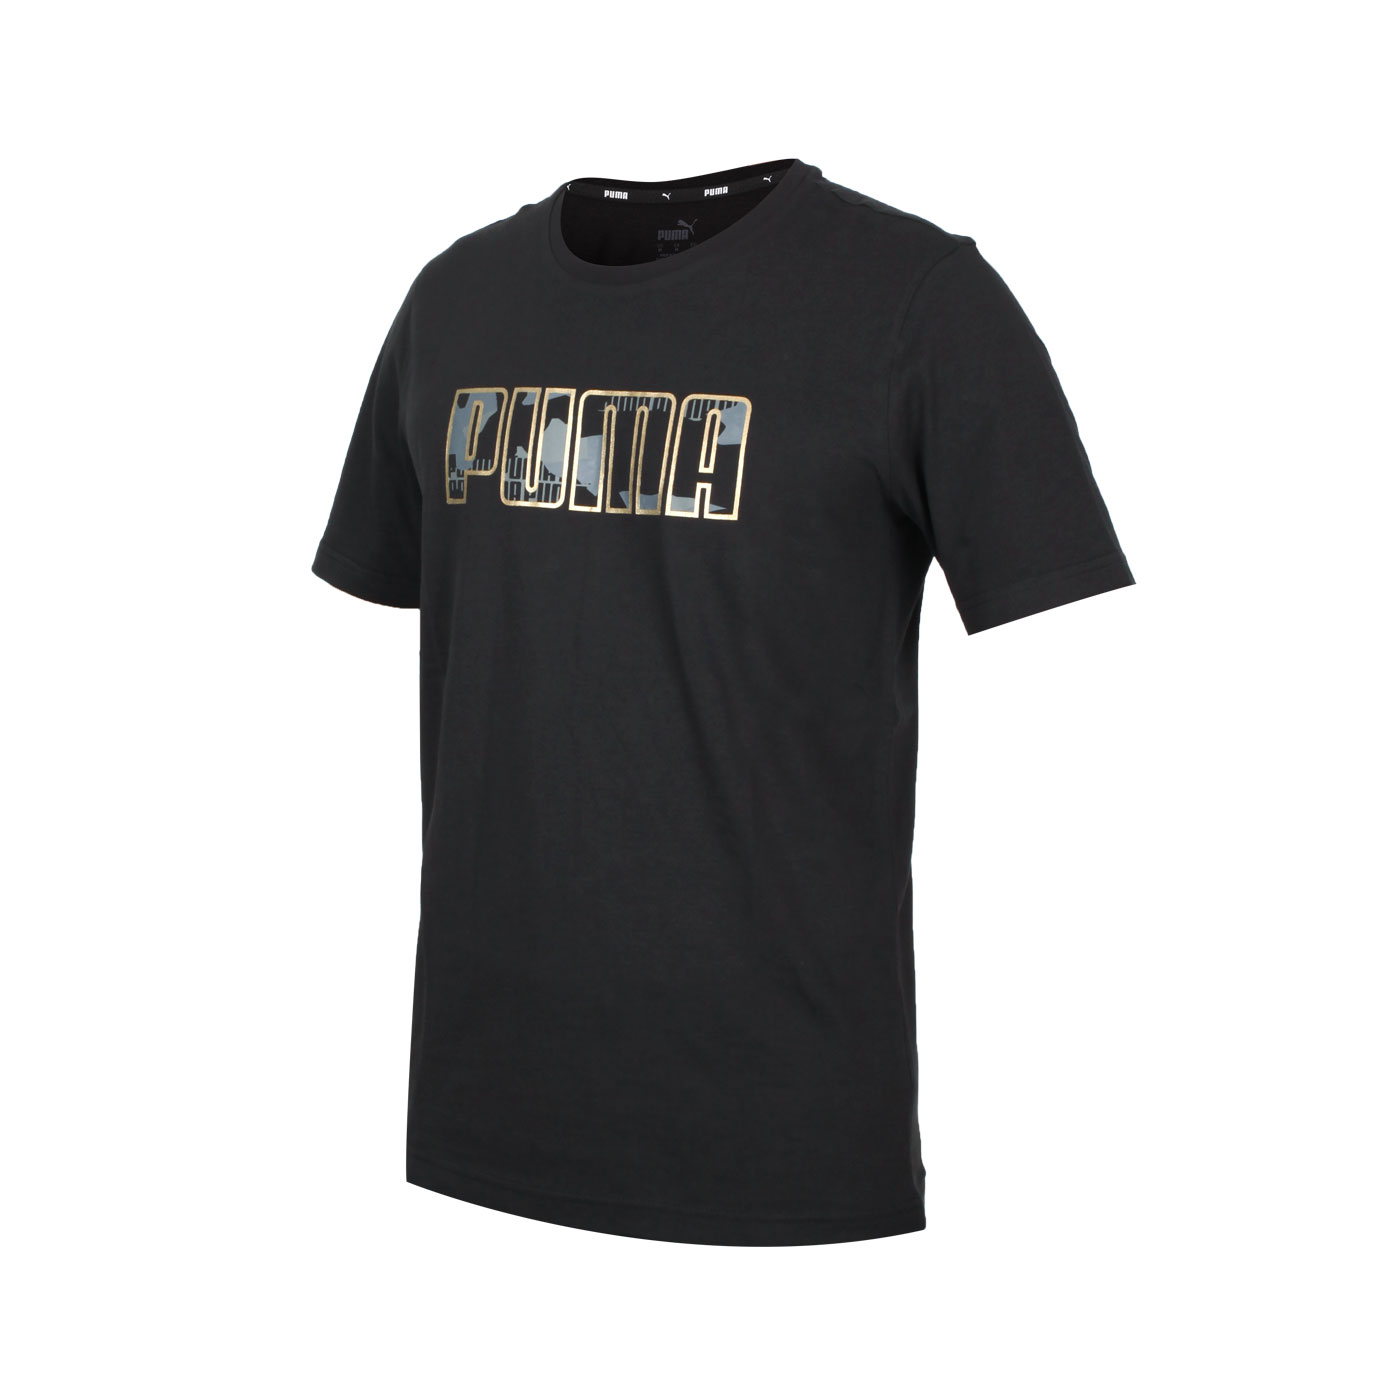 PUMA 男款基本系列短袖T恤 58714401 - 黑金